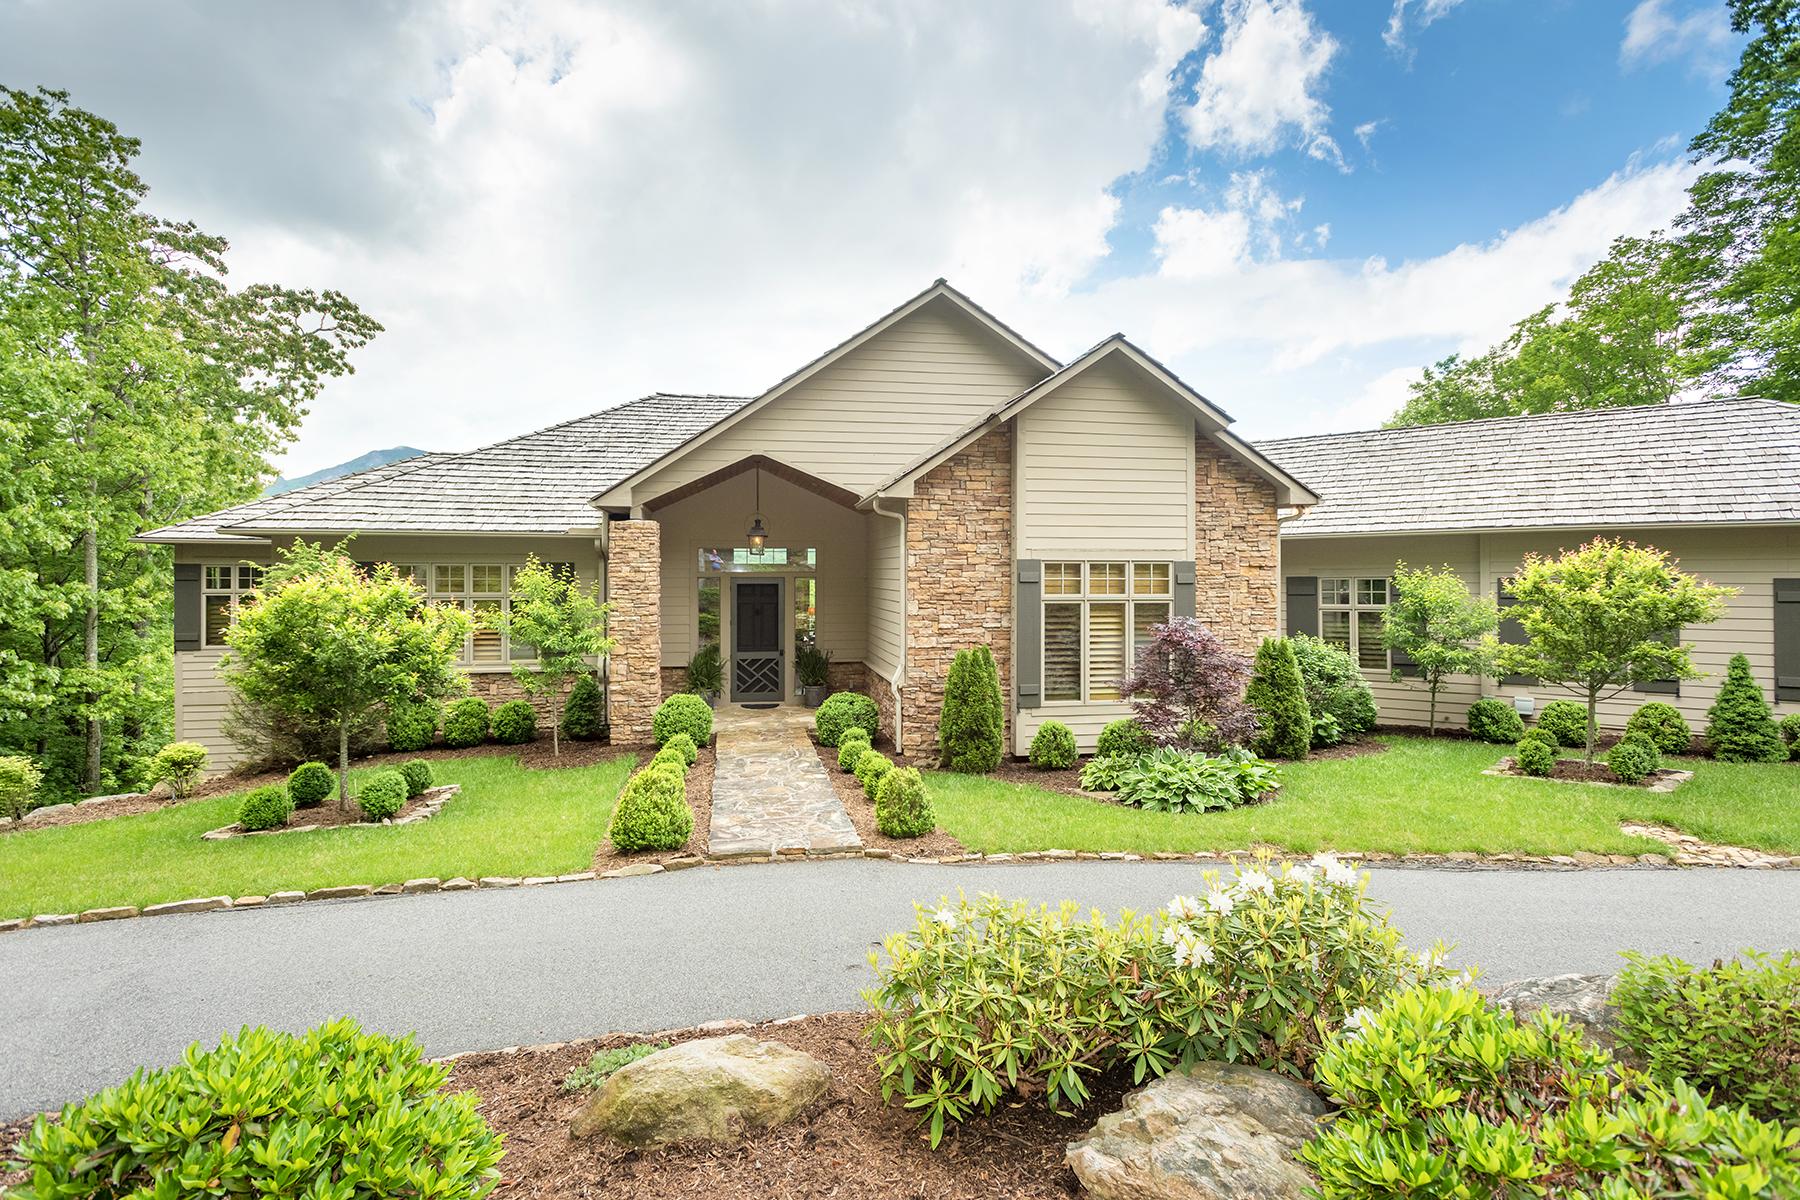 Single Family Home for Sale at LINVILLE RIDGE 1031 Ridge Drive Linville, North Carolina 28646 United States